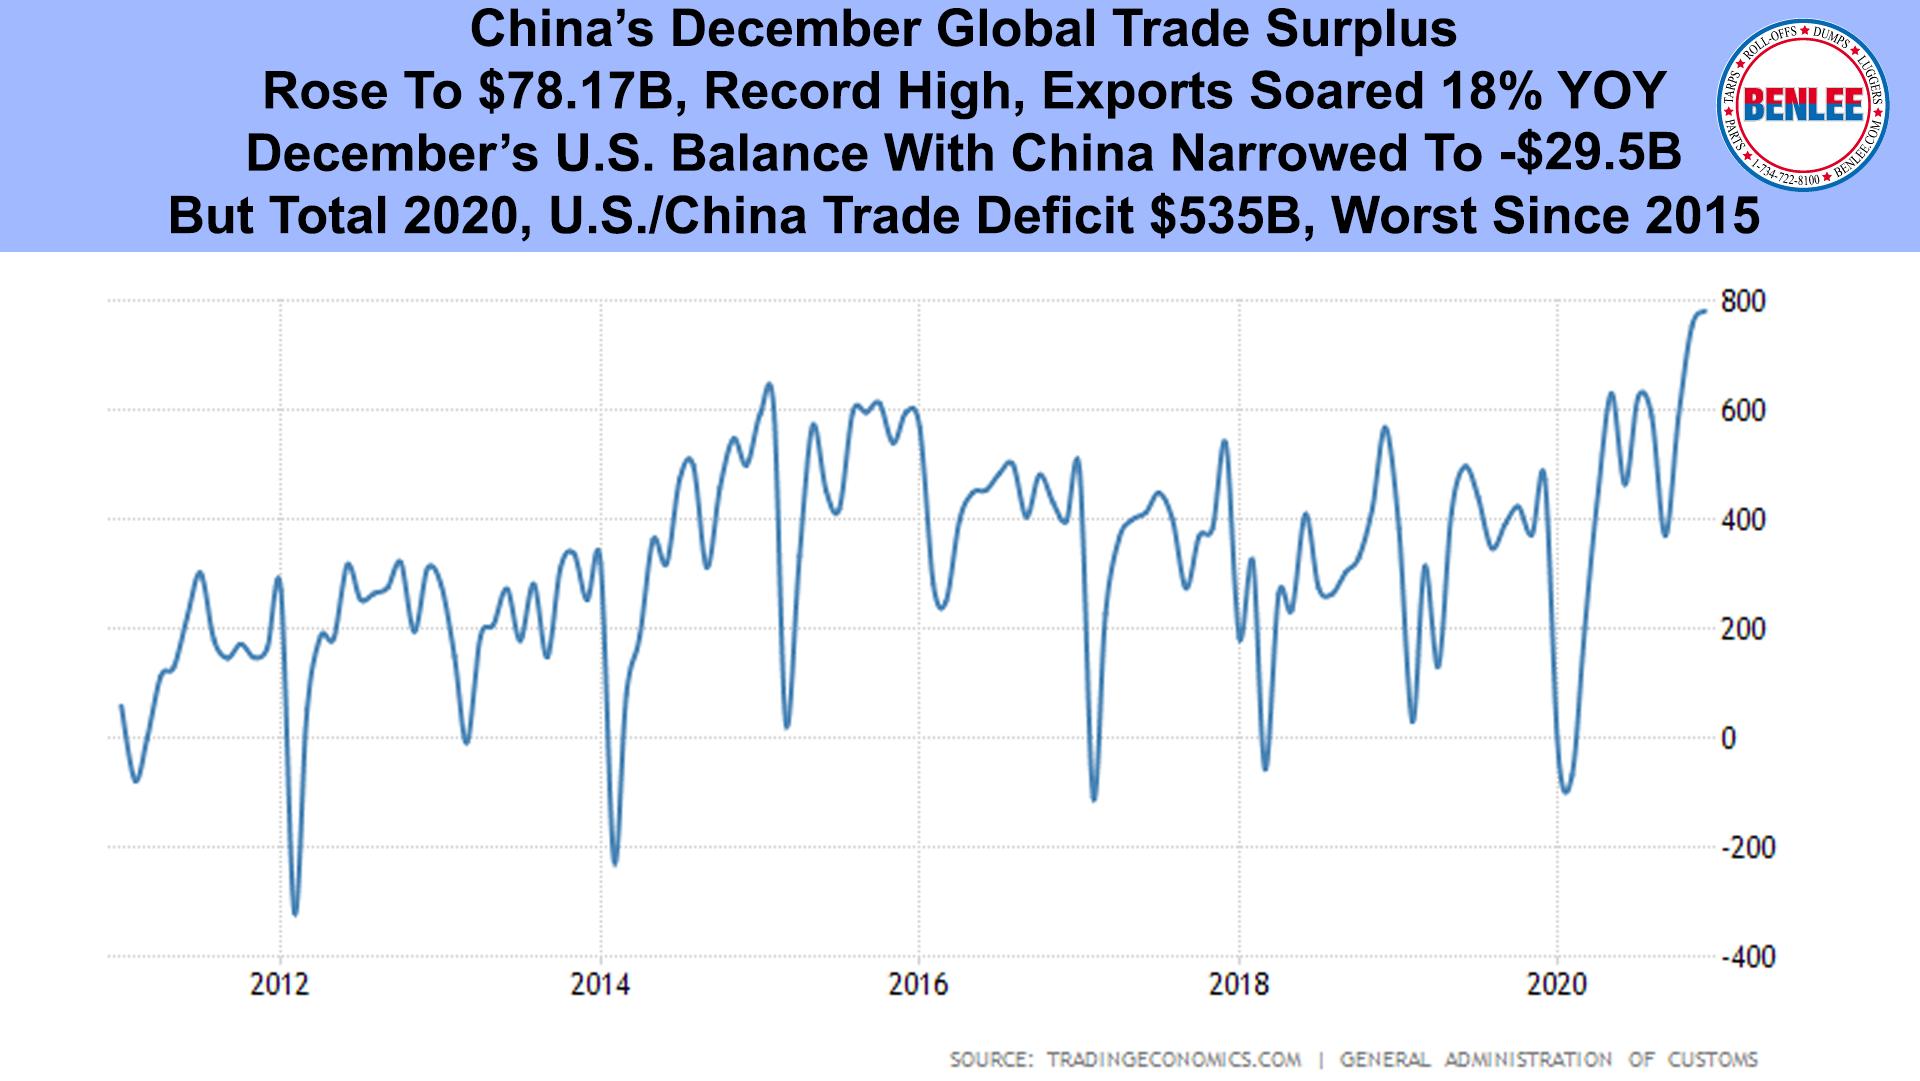 China's December Global Trade Surplus